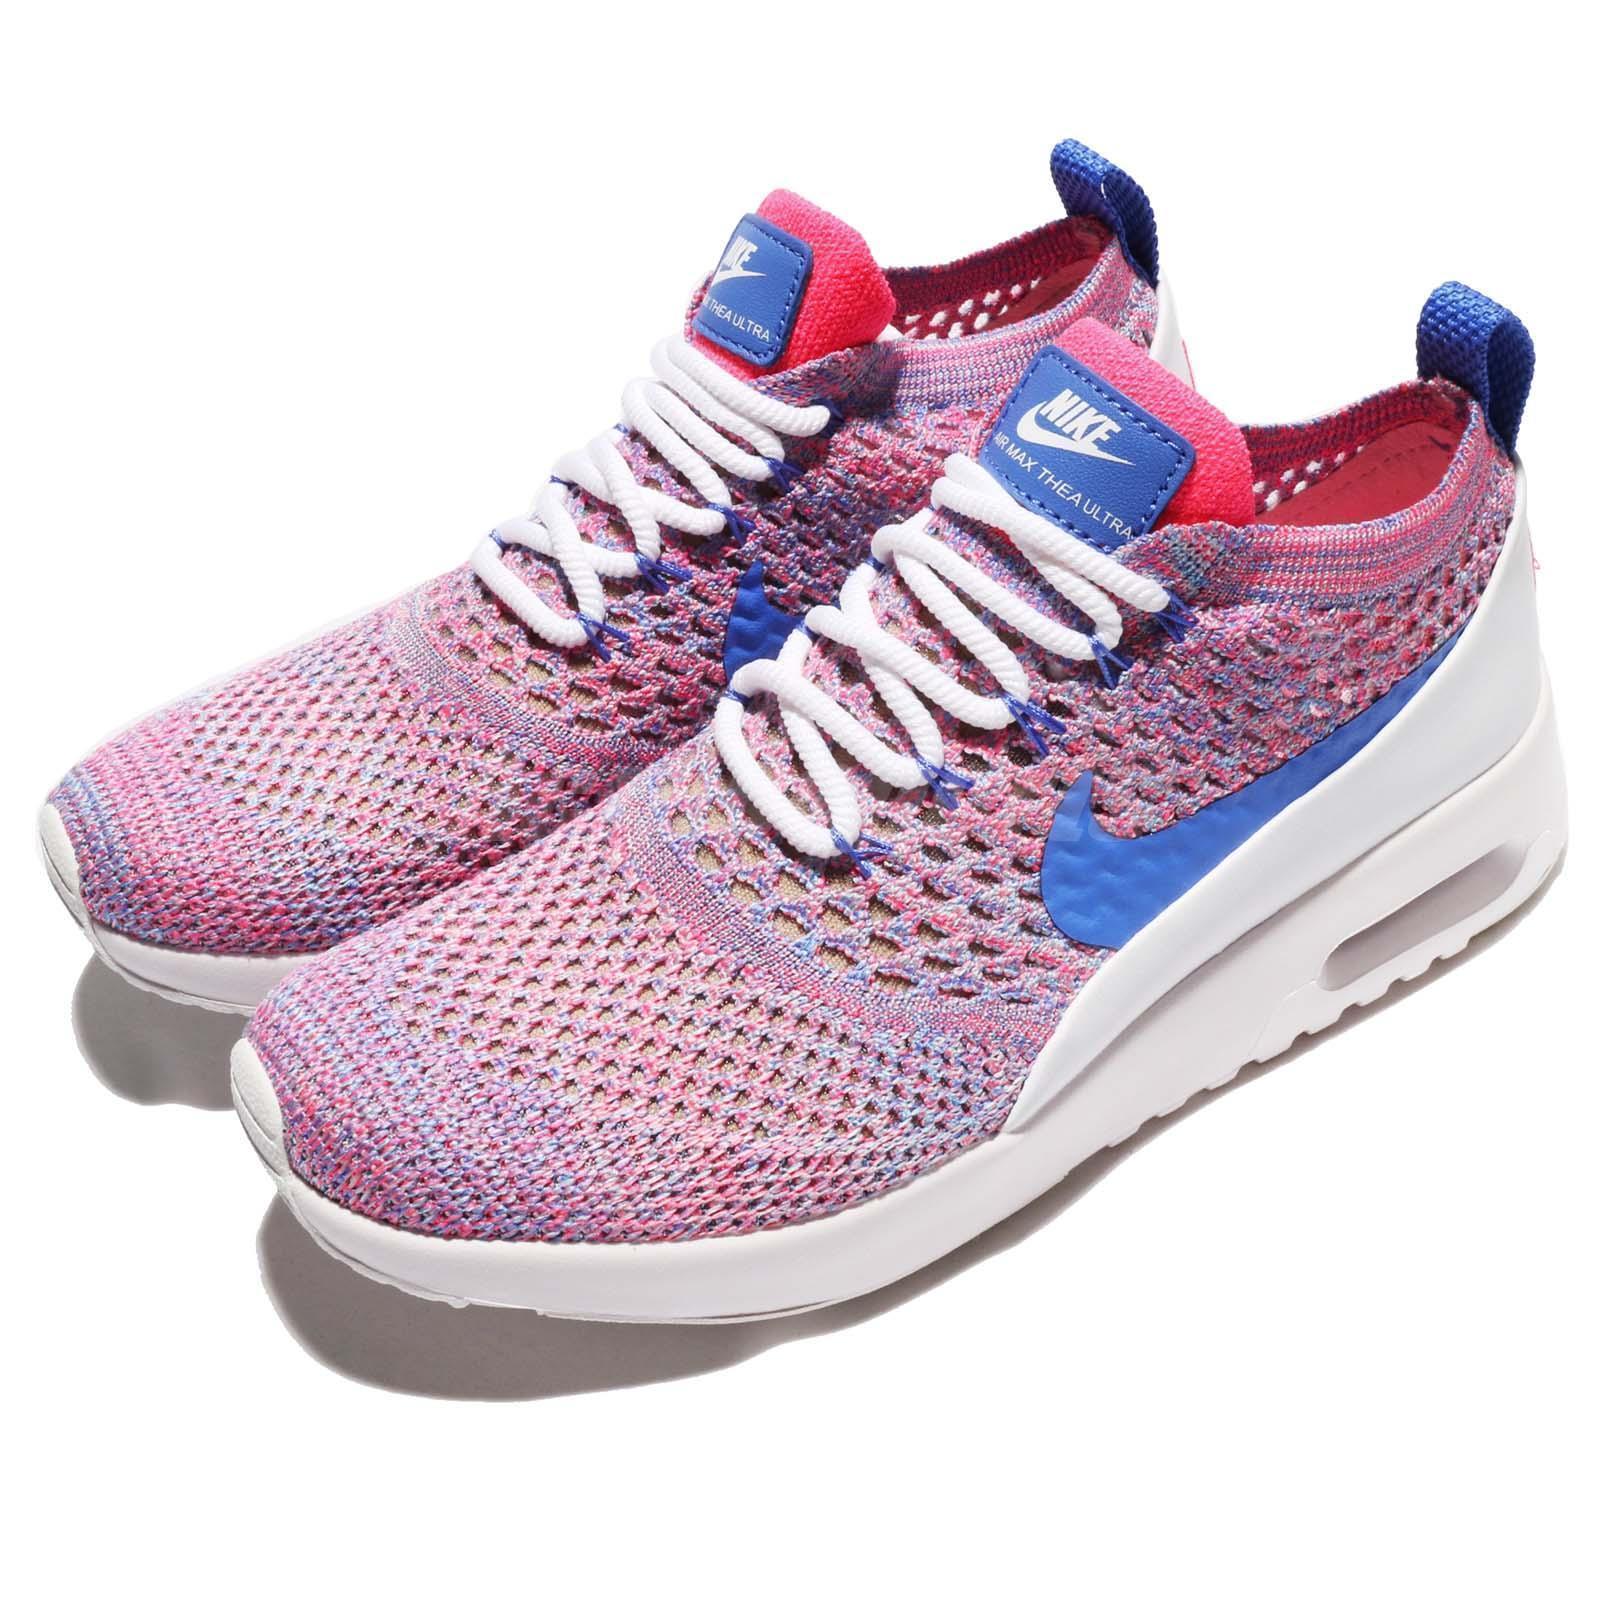 Nike Air Max Thea Ultra FK Flyknit Pink